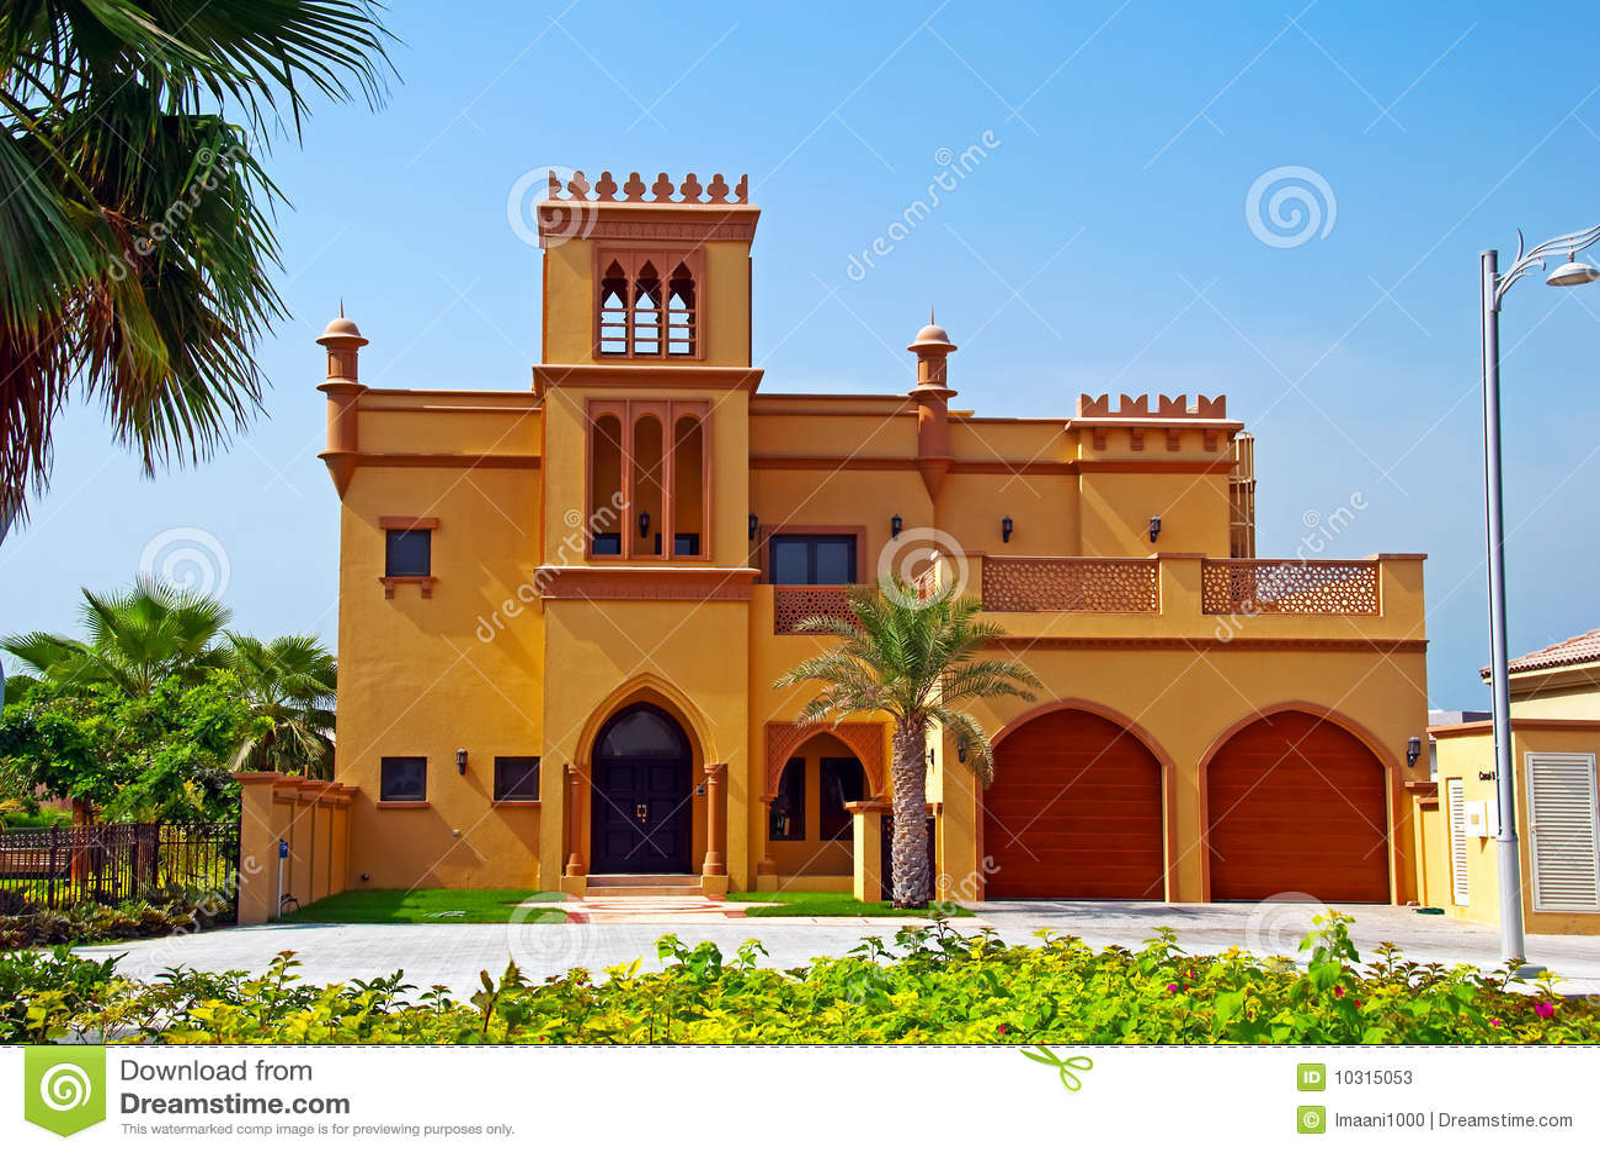 Villa arabe photos stock image 10315053 for Architecture maison arabe